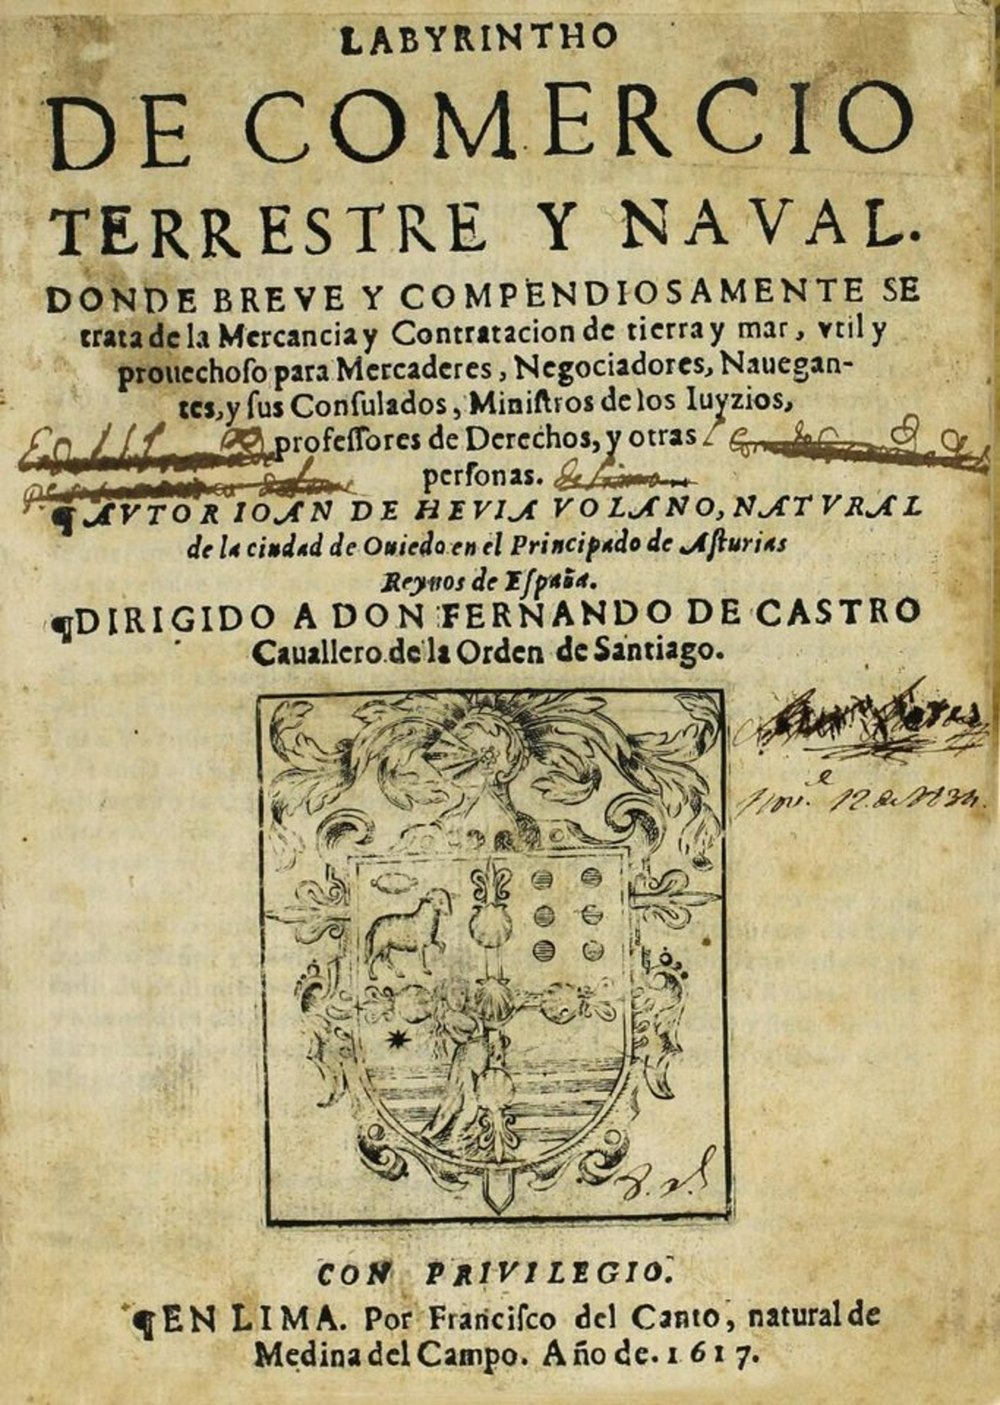 1617 - Bolano - Laberyntho de comercio.jpg